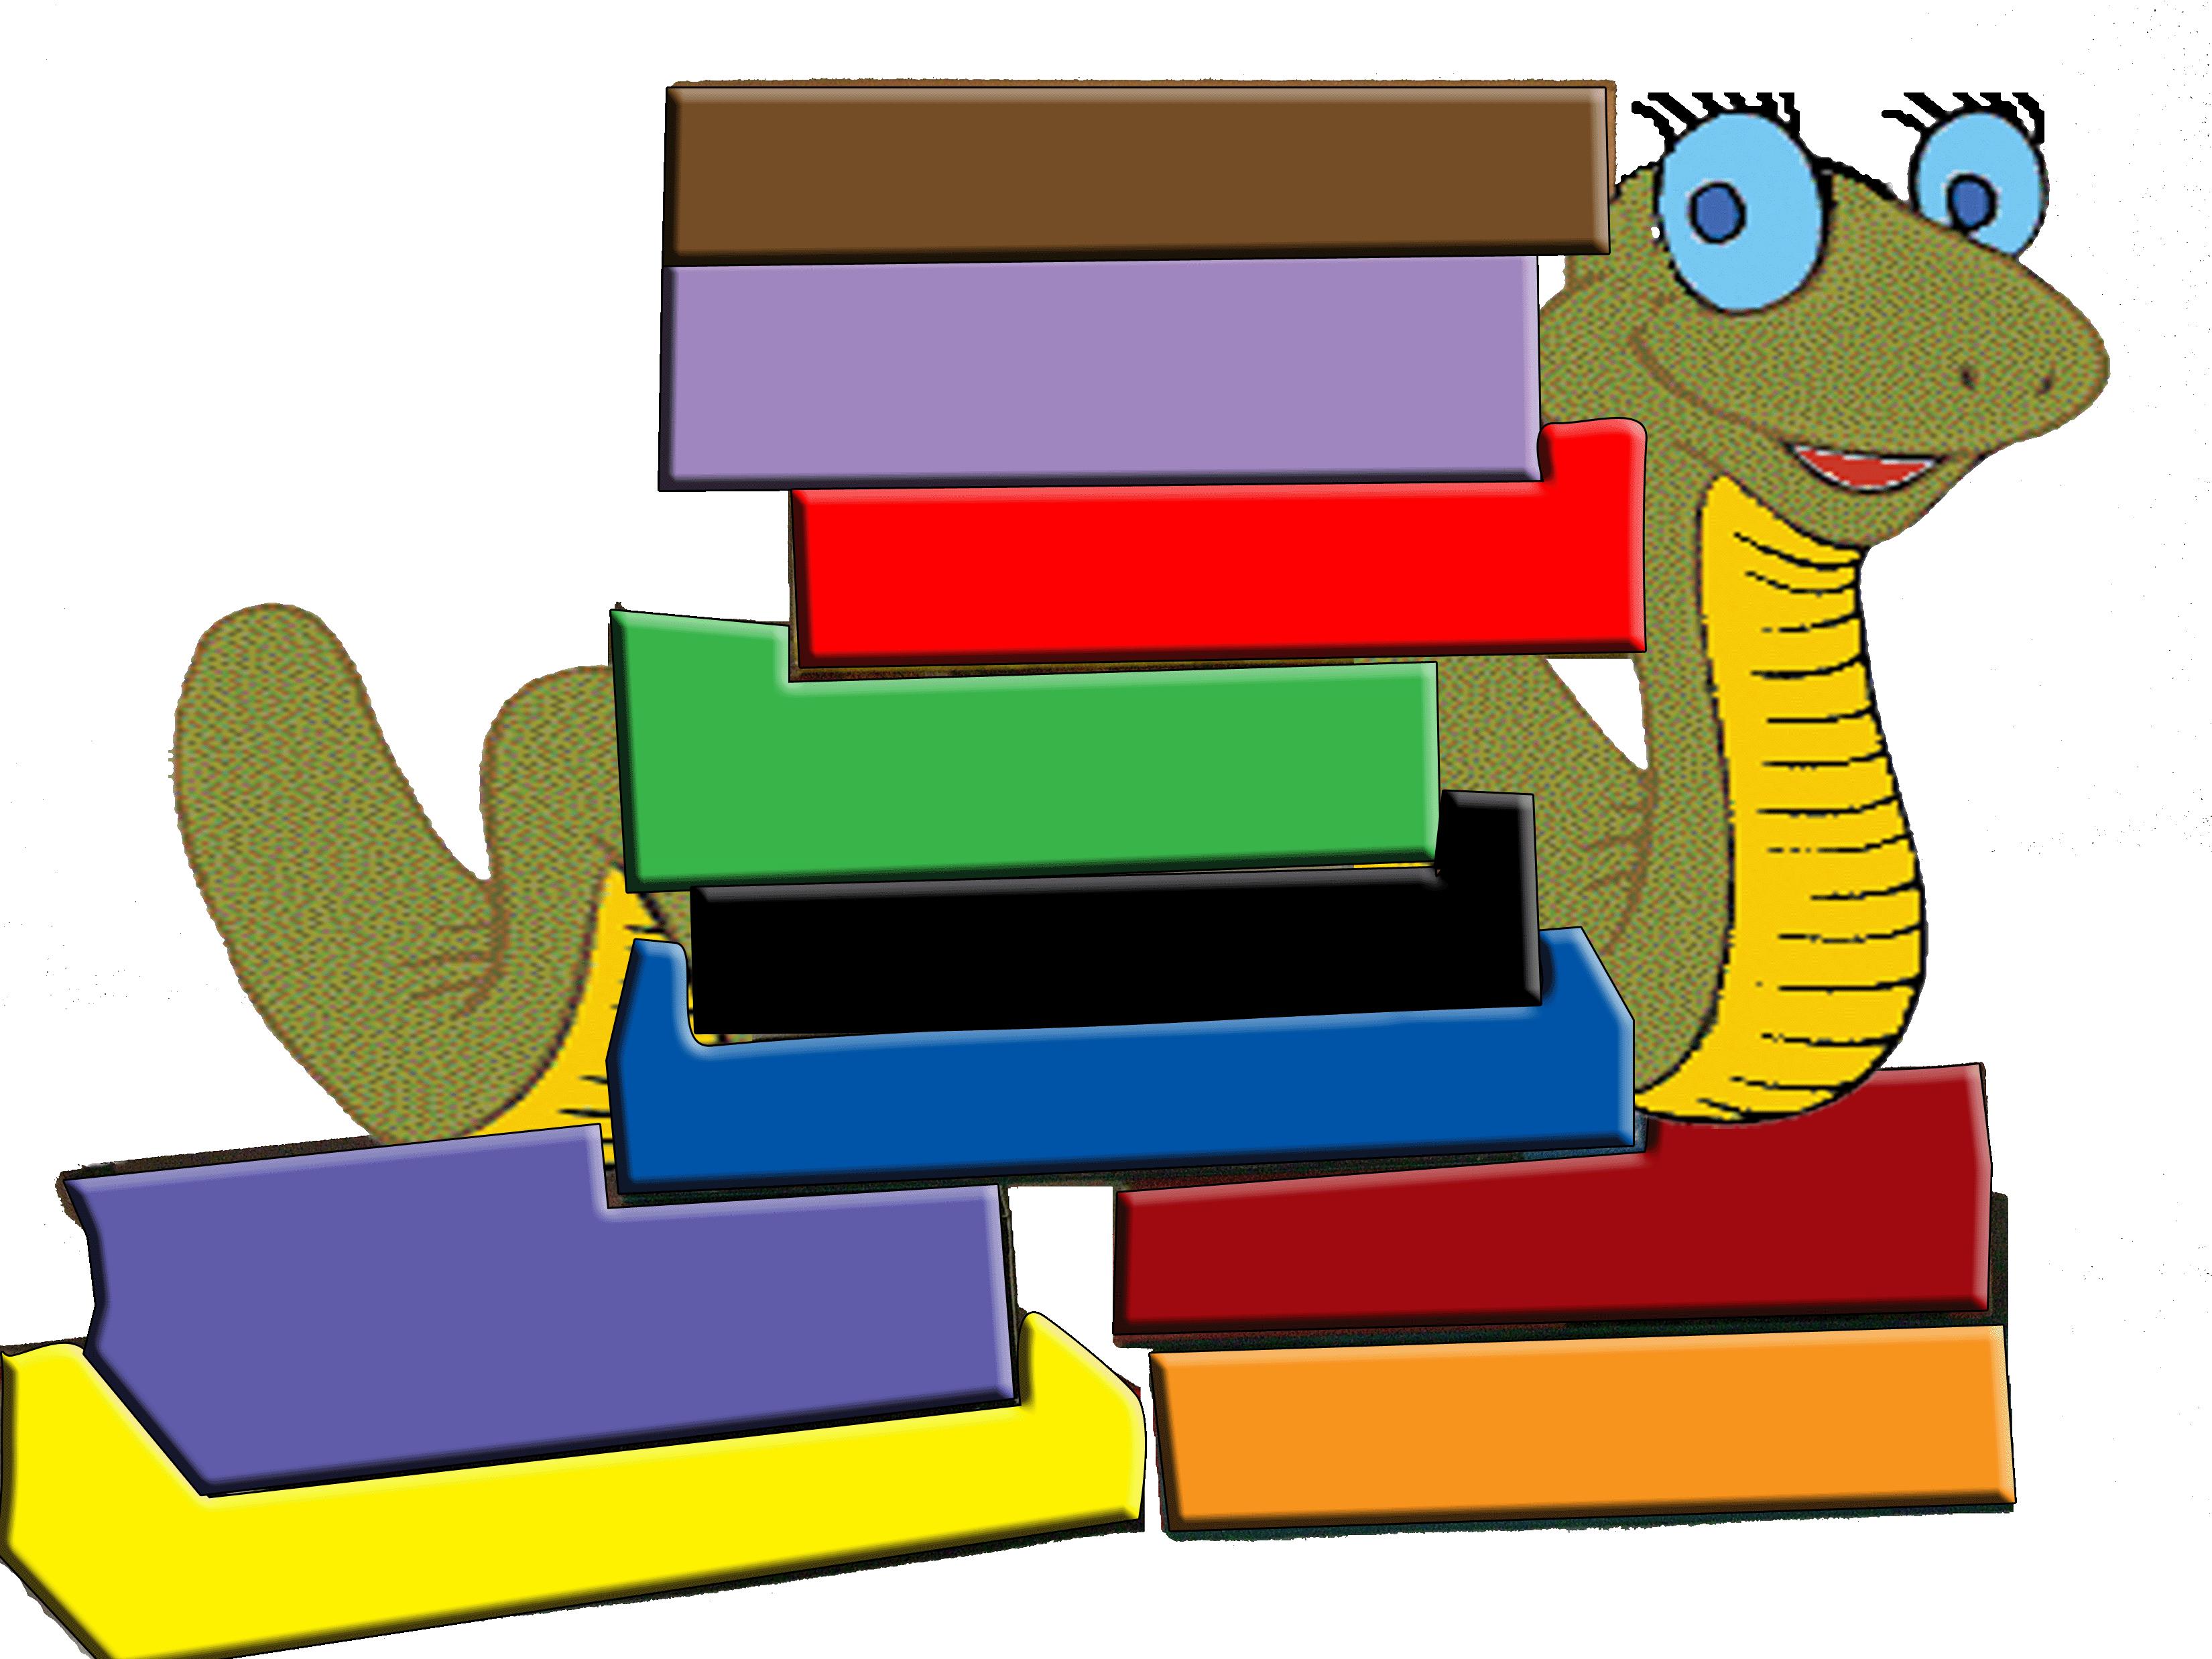 Childrens books clip art. Book clipart children's book